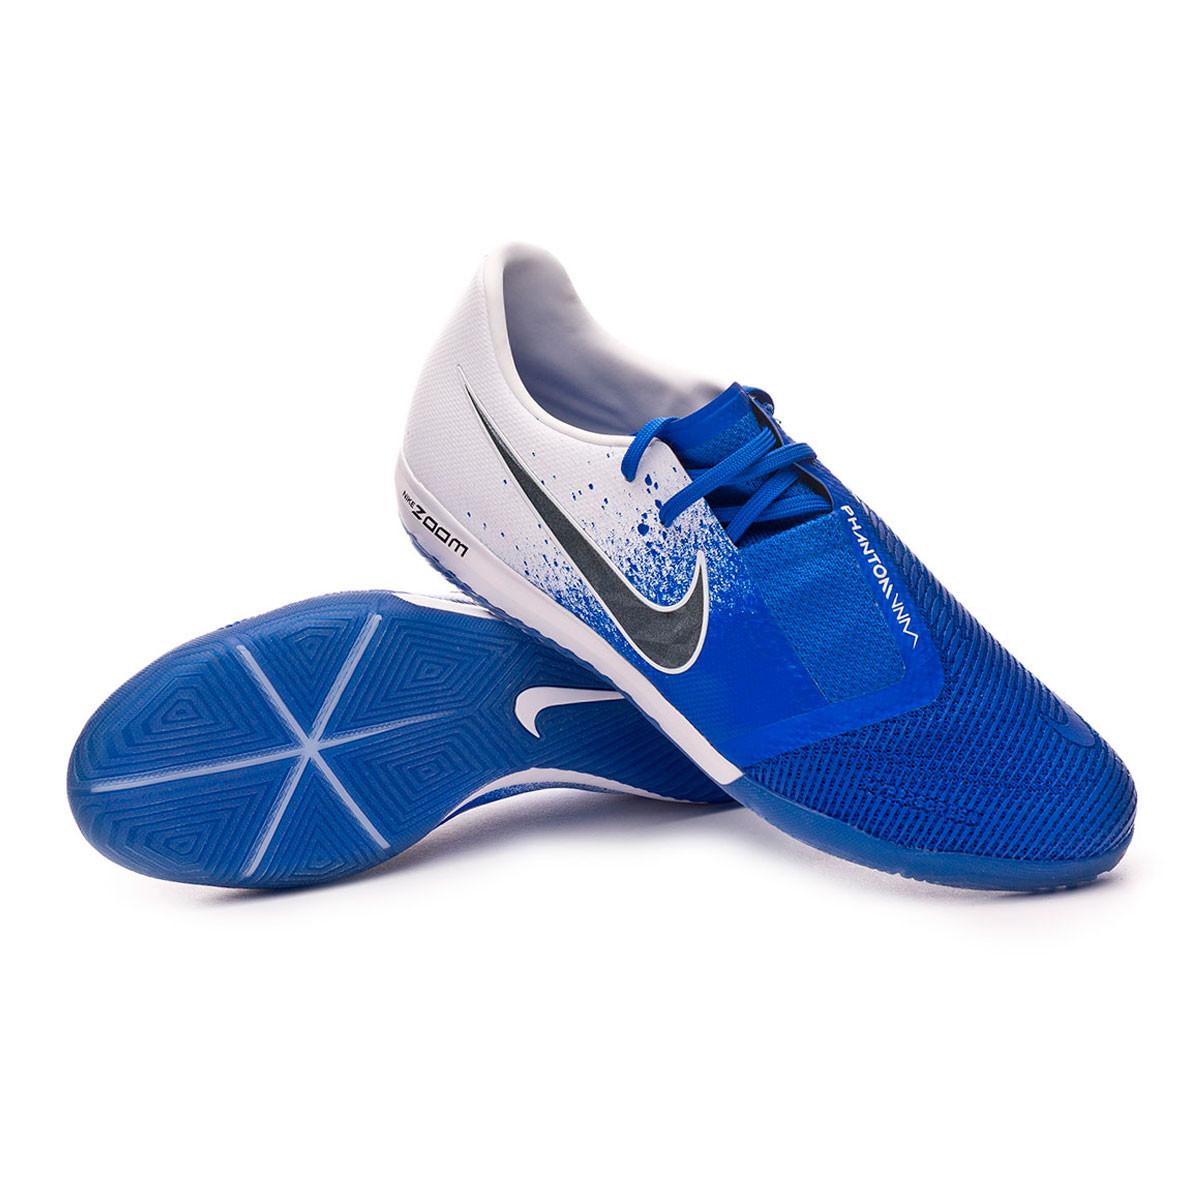 37461aad0 Futsal Boot Nike Zoom Phantom Venom Pro IC White-Black-Racer blue -  Football store Fútbol Emotion